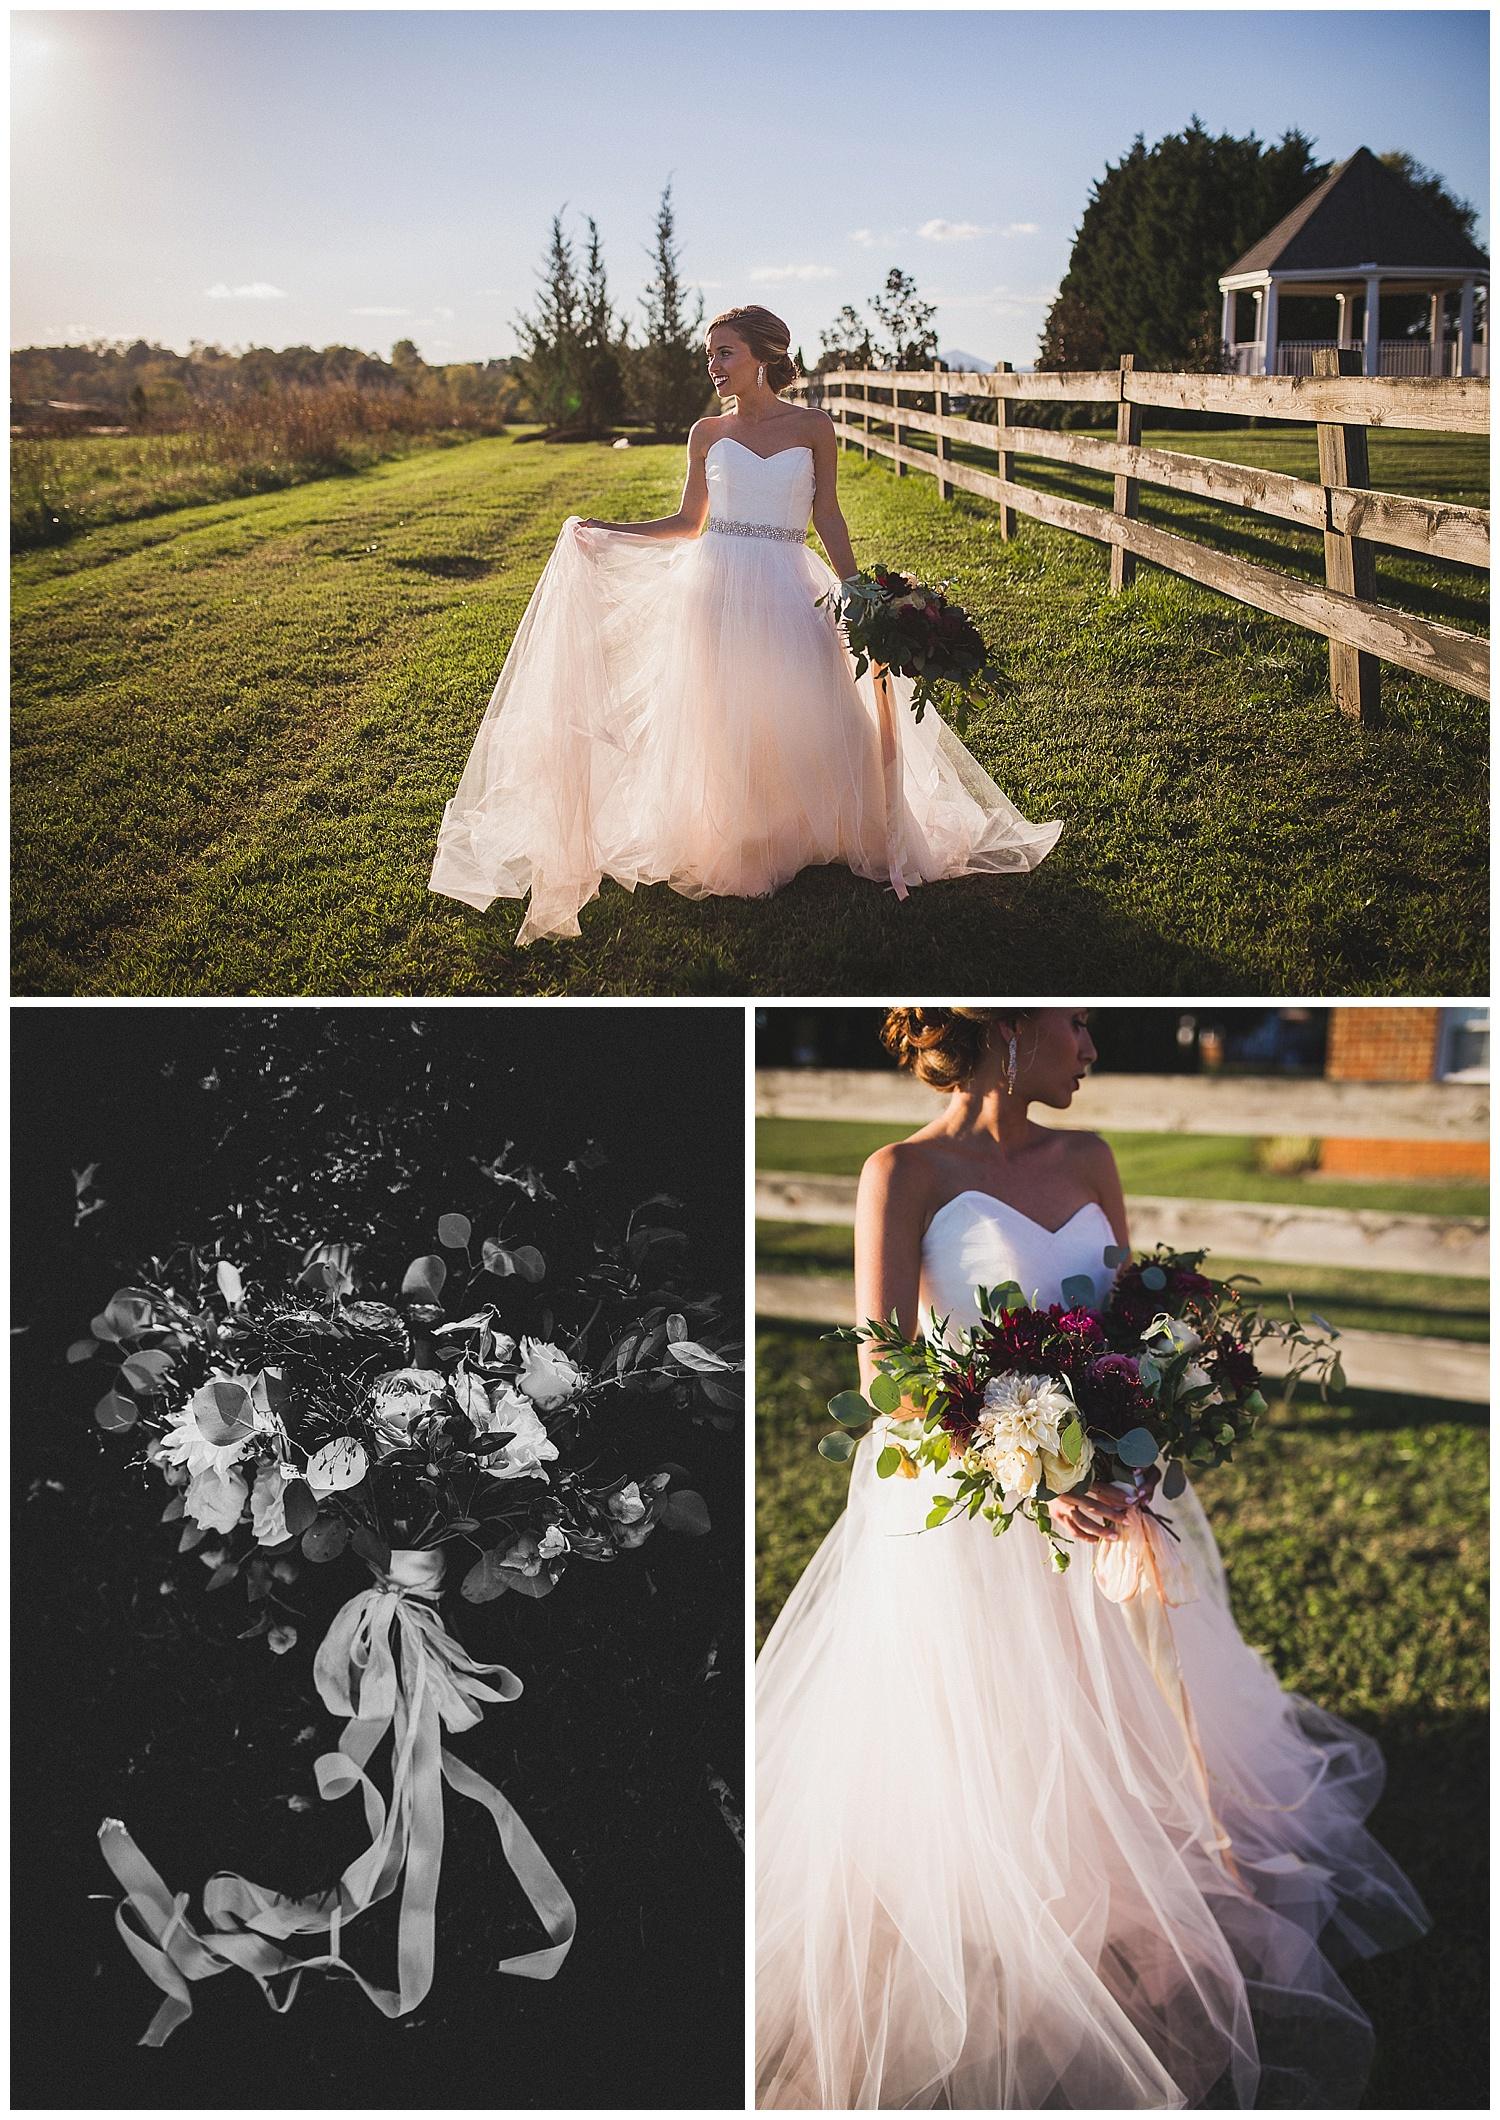 EmilyRogers-southwest-virginia-creative-wedding-photographer_0193.jpg